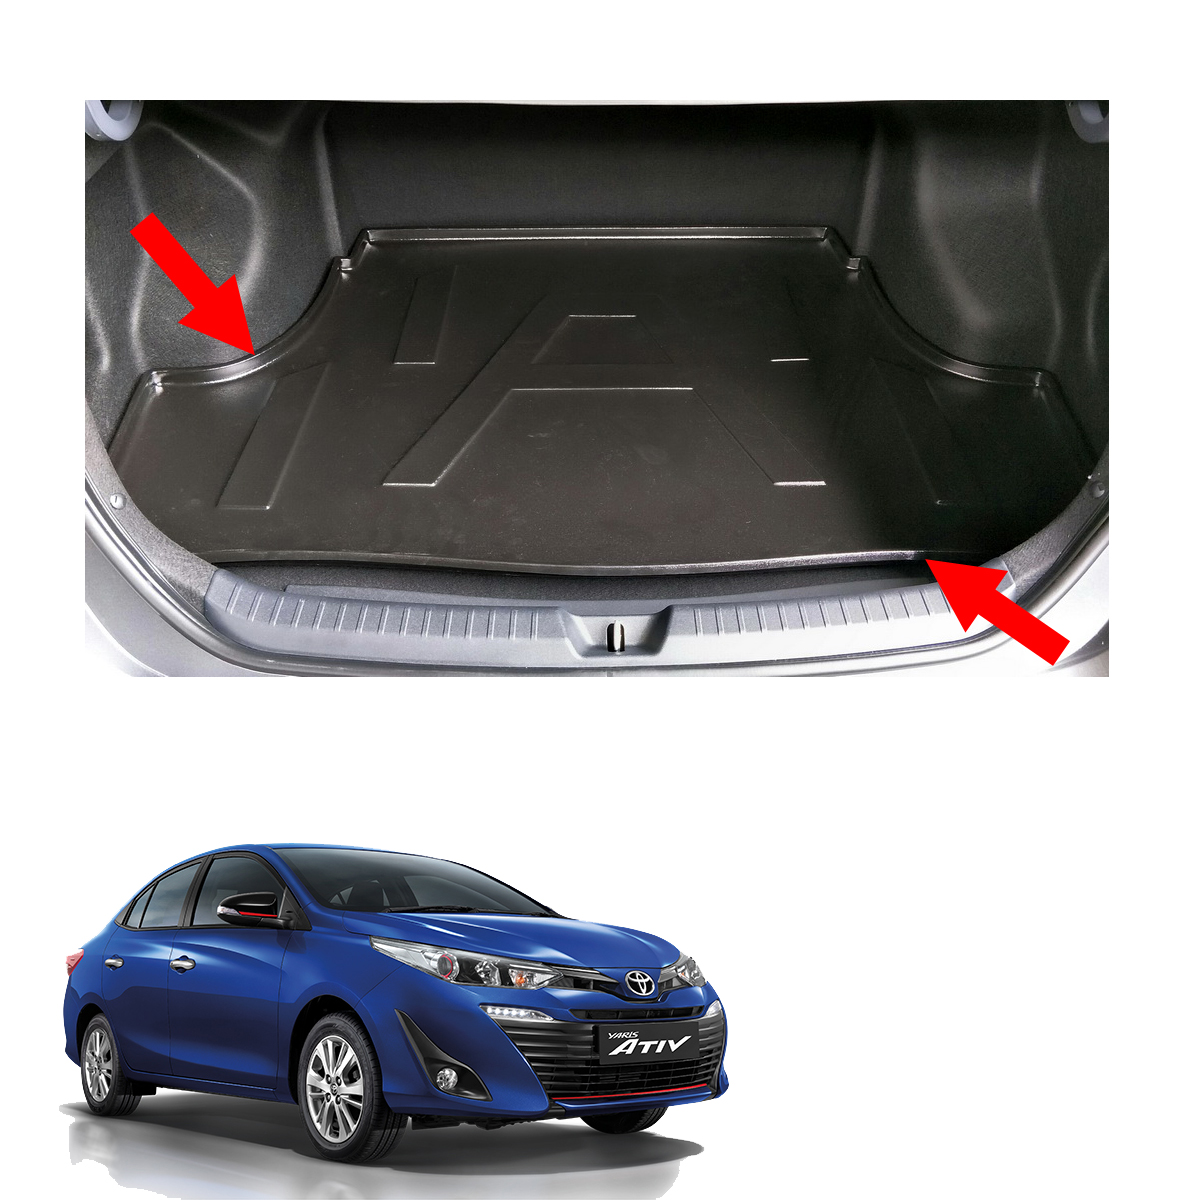 Pro Trim Panel Remover Tool Kit for Toyota Yaris//Vitz Interior Exterior Dash